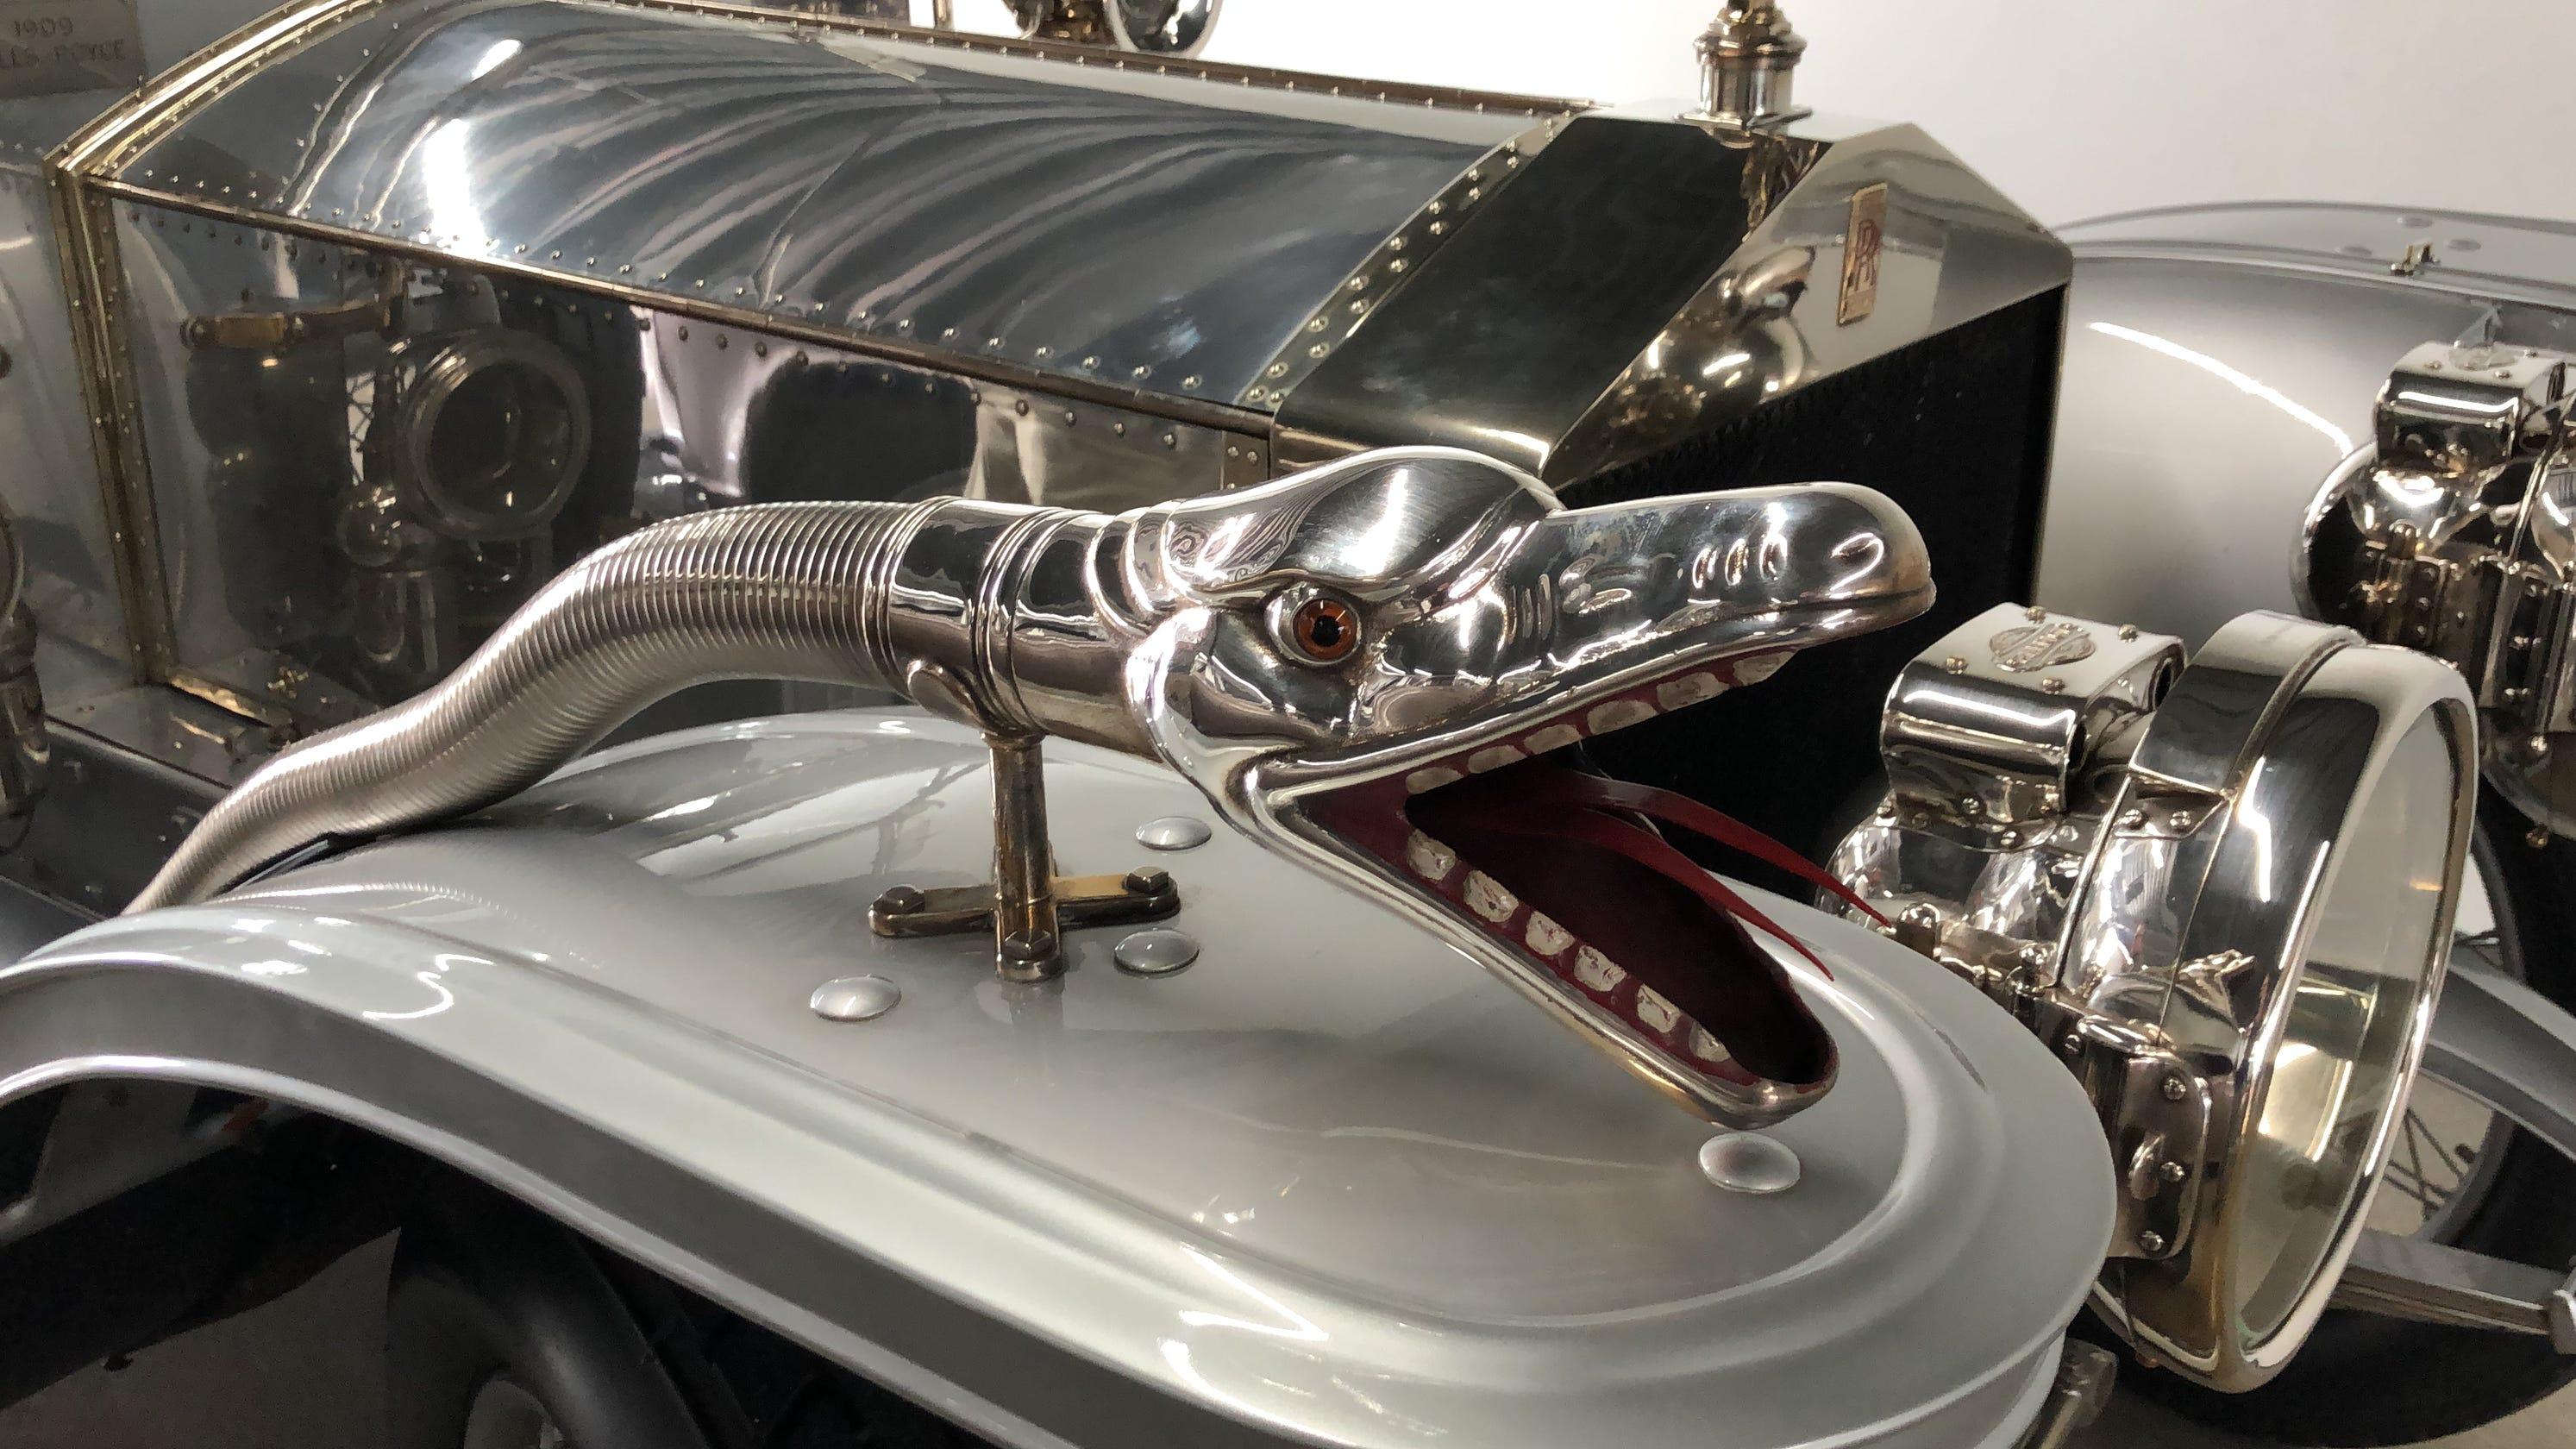 1909 Rolls-Royce Silver Ghost: Peek Inside This Classic Car